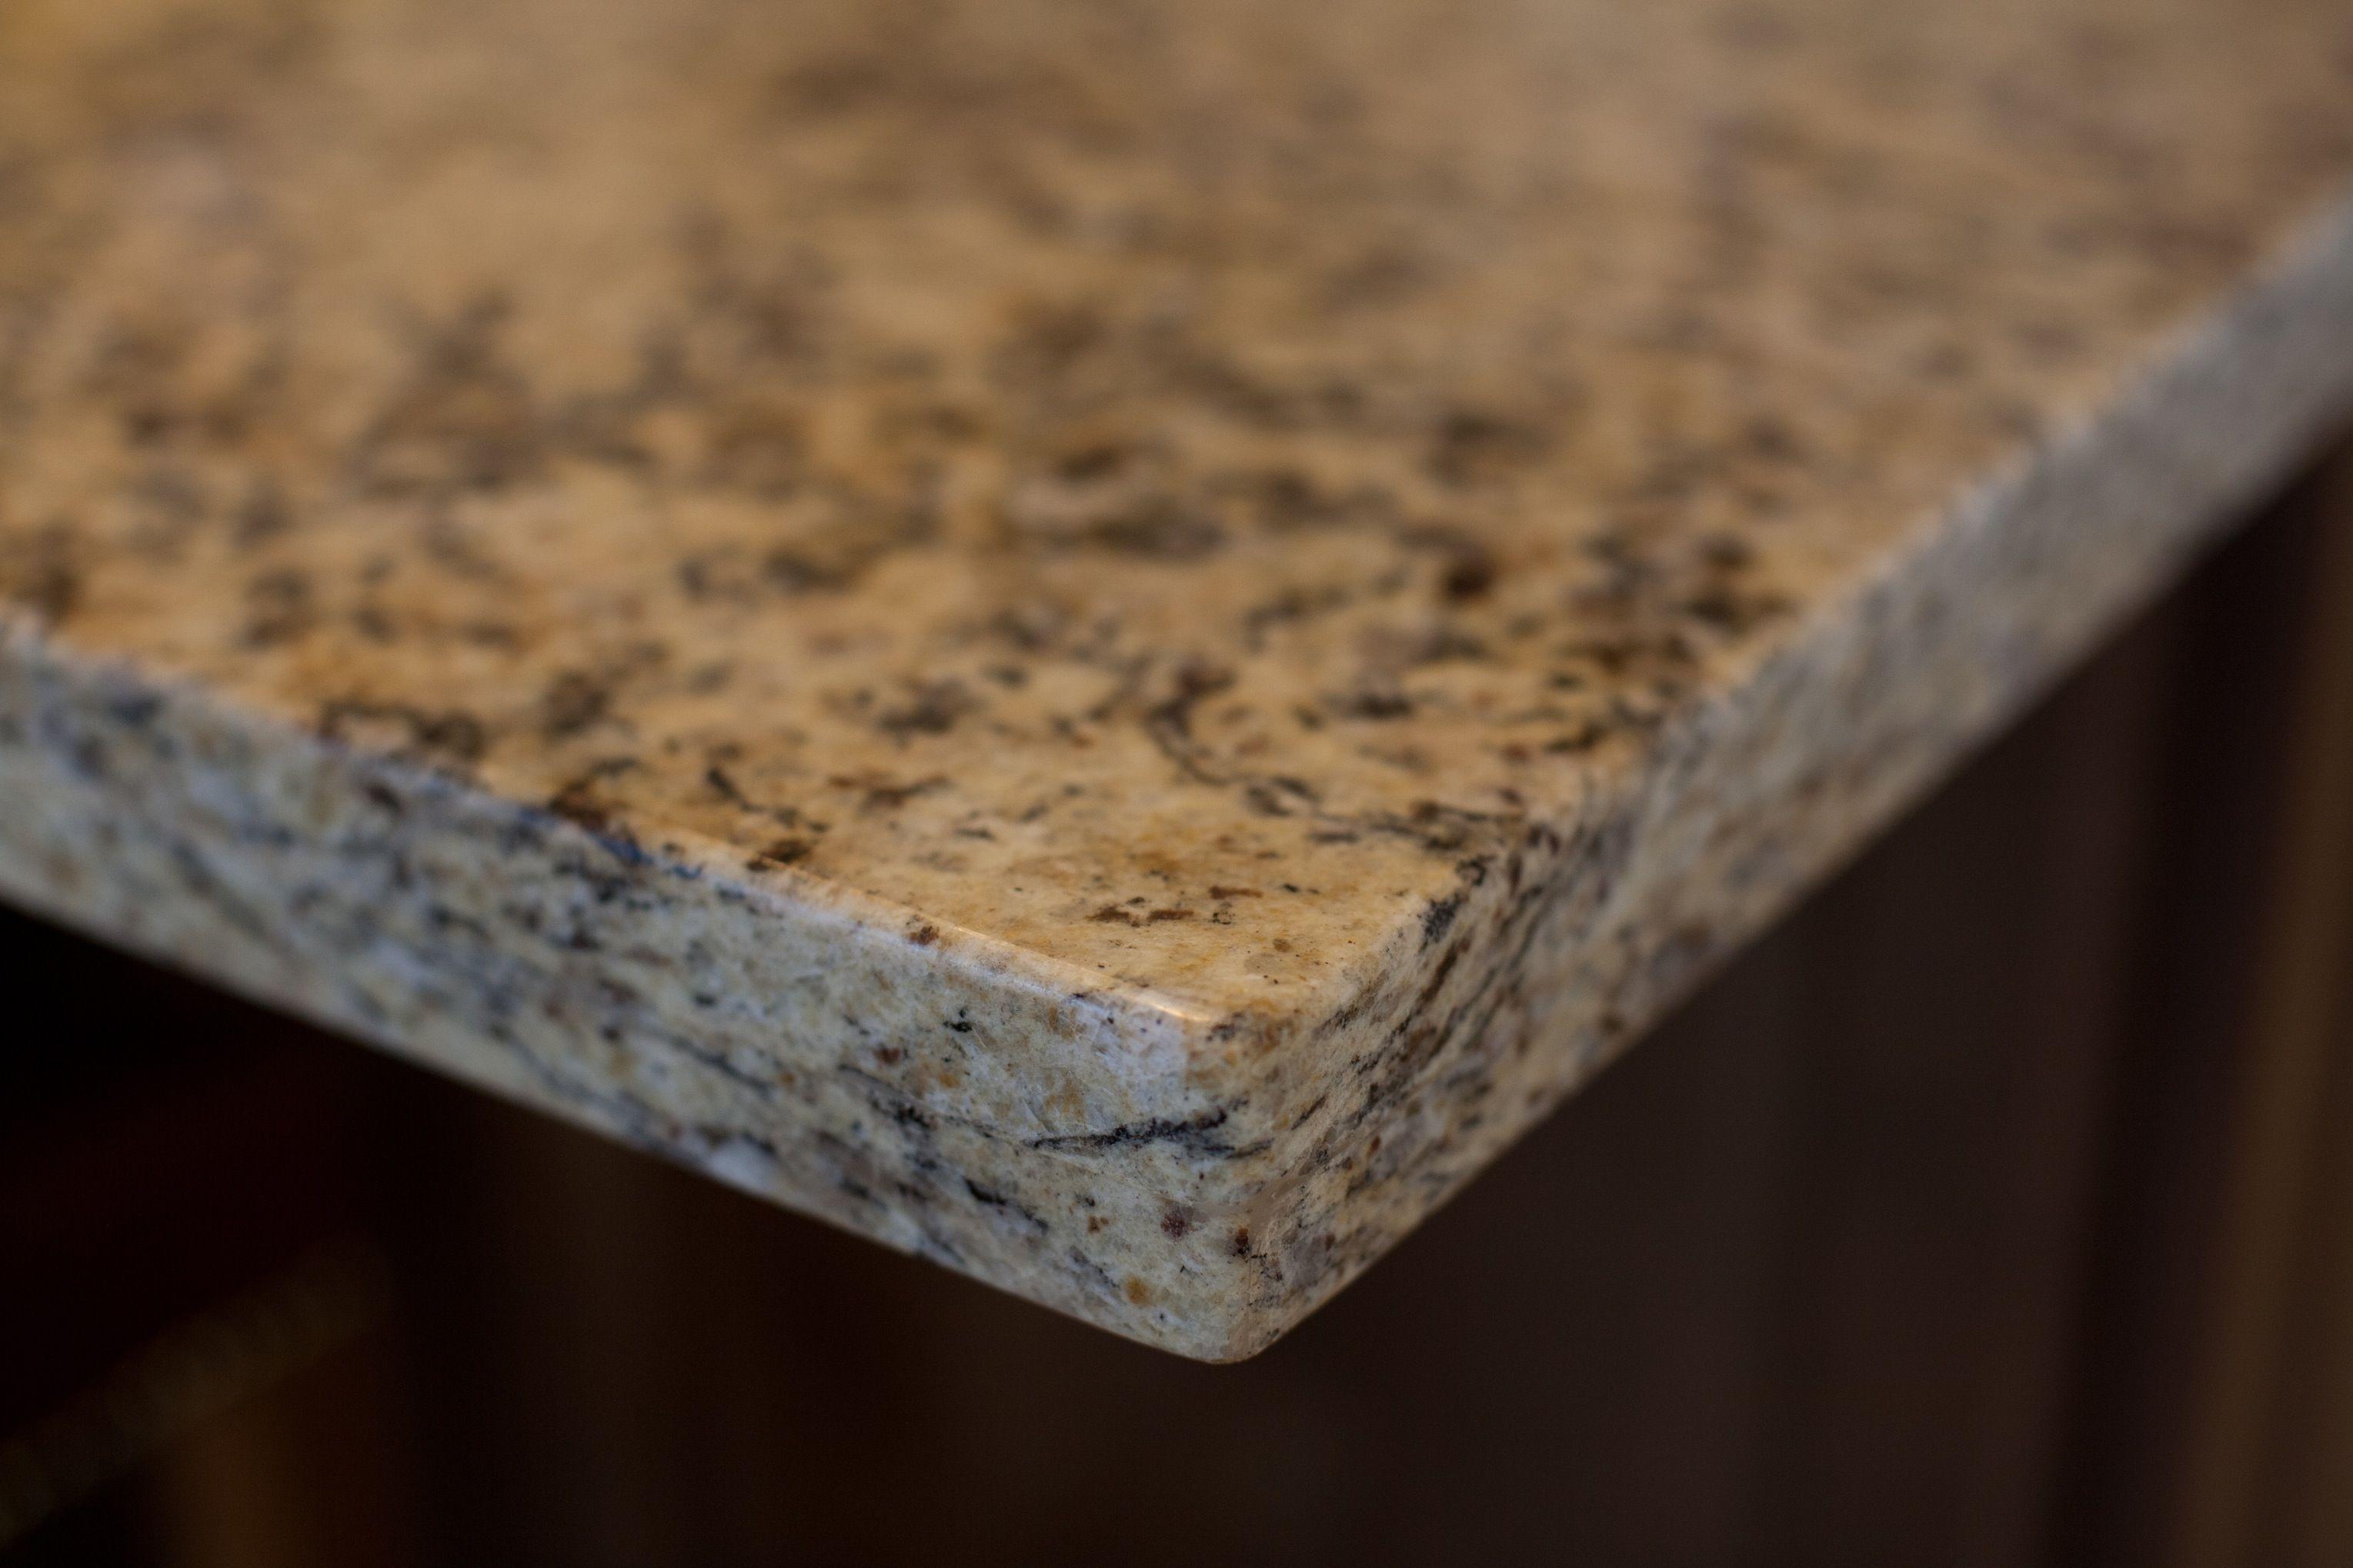 GRANITE SLAB KITCHEN COUNTERTOP U0026 BACKSPLASH  Kitchens Feature A Sleek Granite  Countertop With Stylish 1 Square Edge Detail. A Back Splash With Full  Height ...